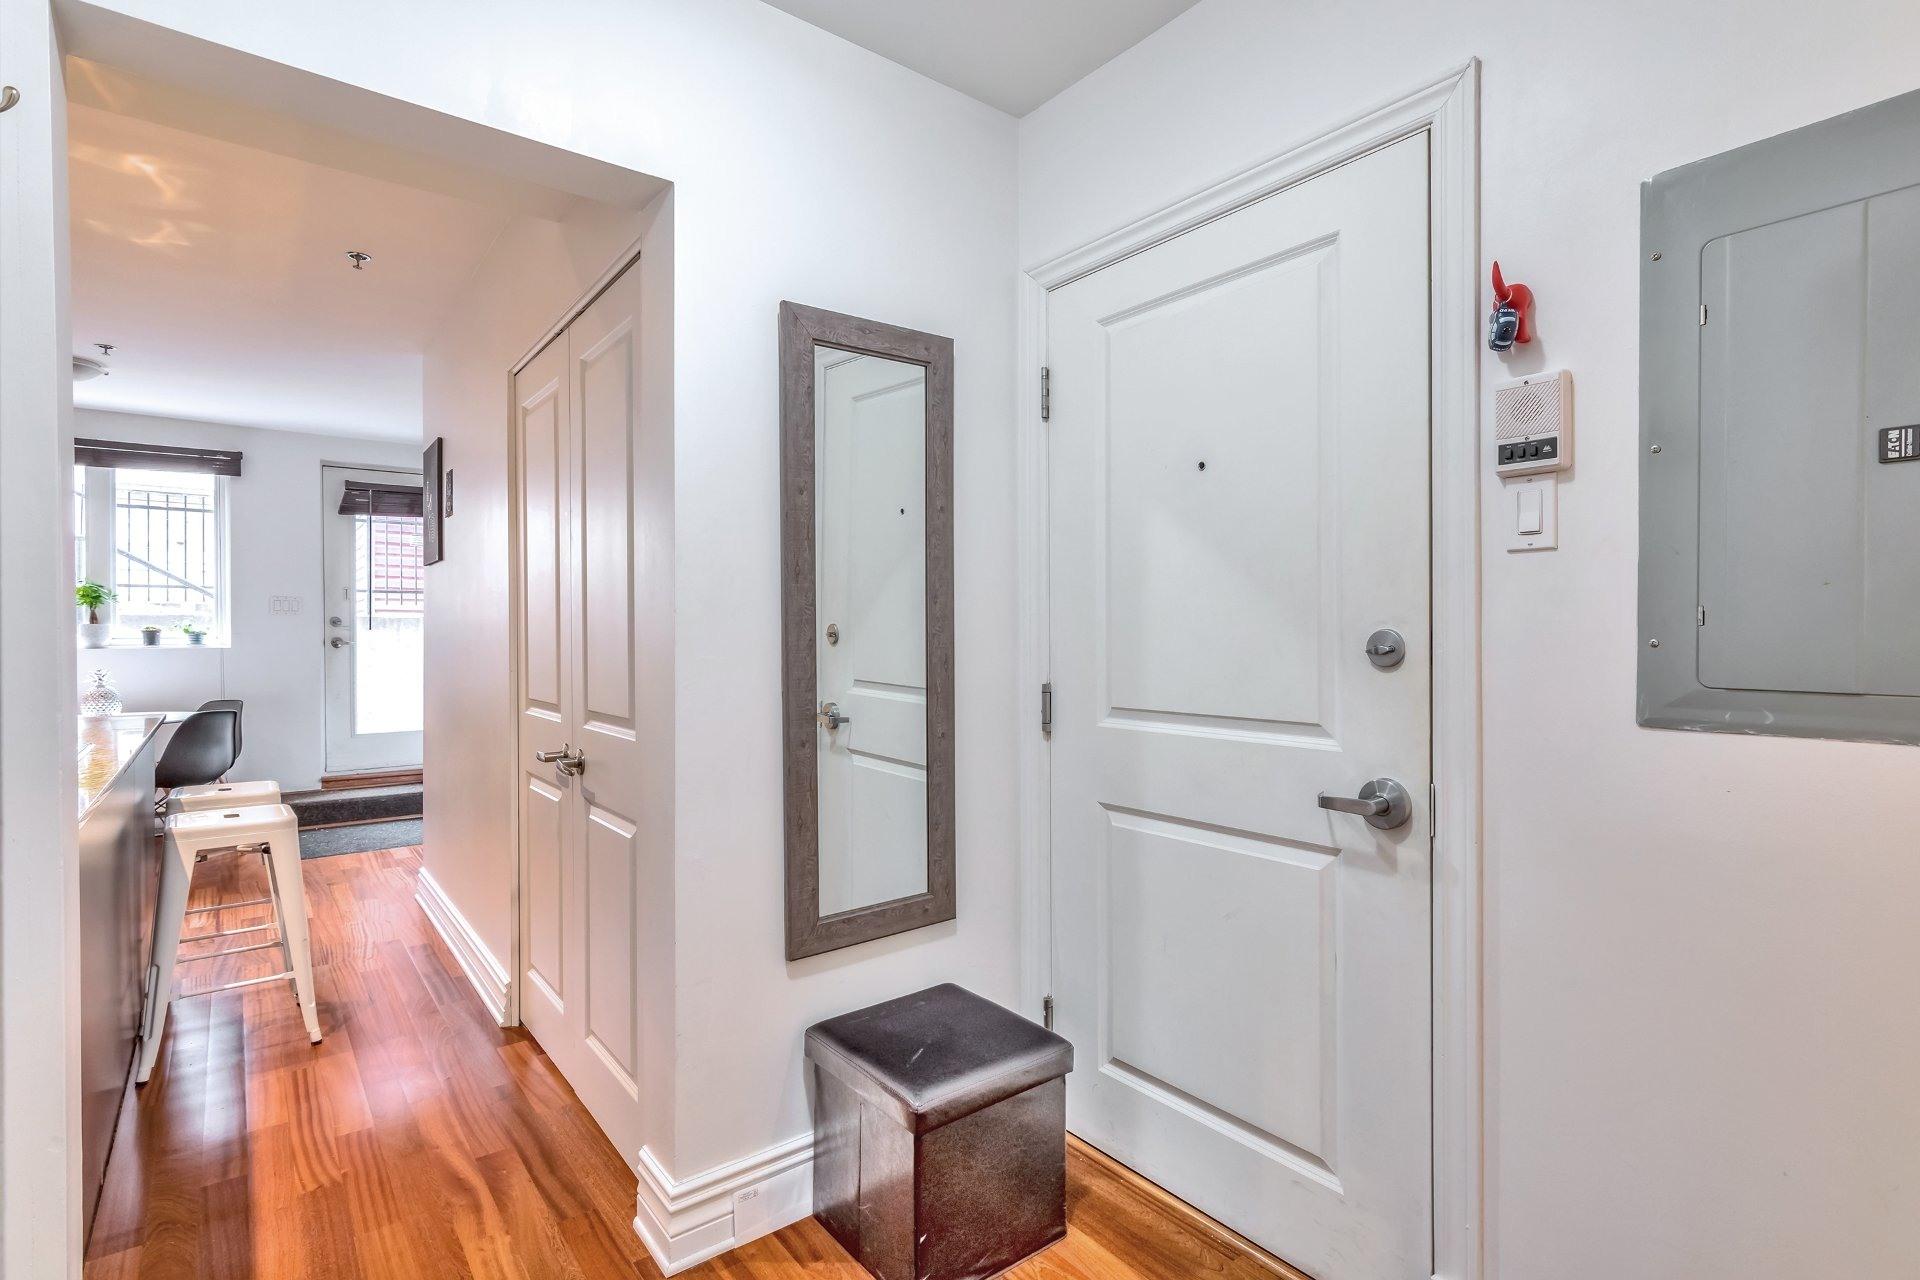 image 16 - Departamento En venta Le Plateau-Mont-Royal Montréal  - 3 habitaciones